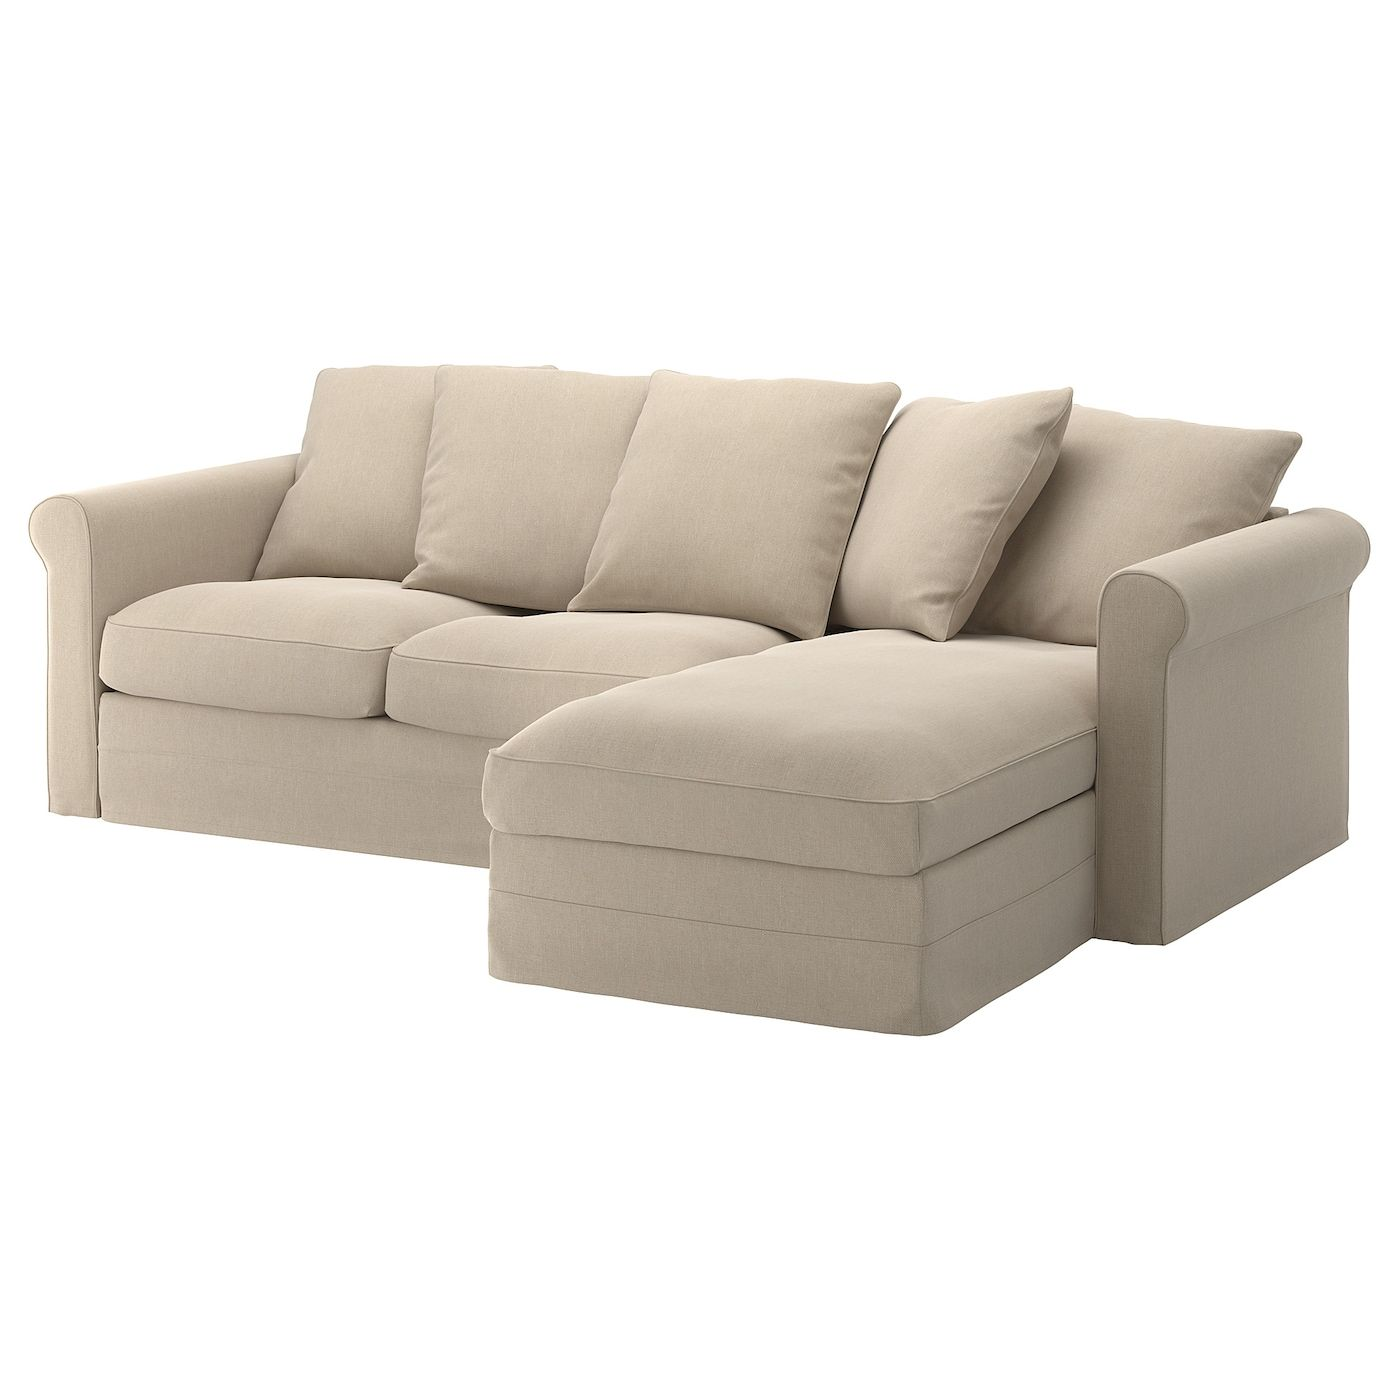 Gronlid 3er Sofa Mit Recamiere Sporda Naturfarben Ikea Deutschland In 2020 Cheap Sofa Sets Cheap Sofas Ikea Sofa